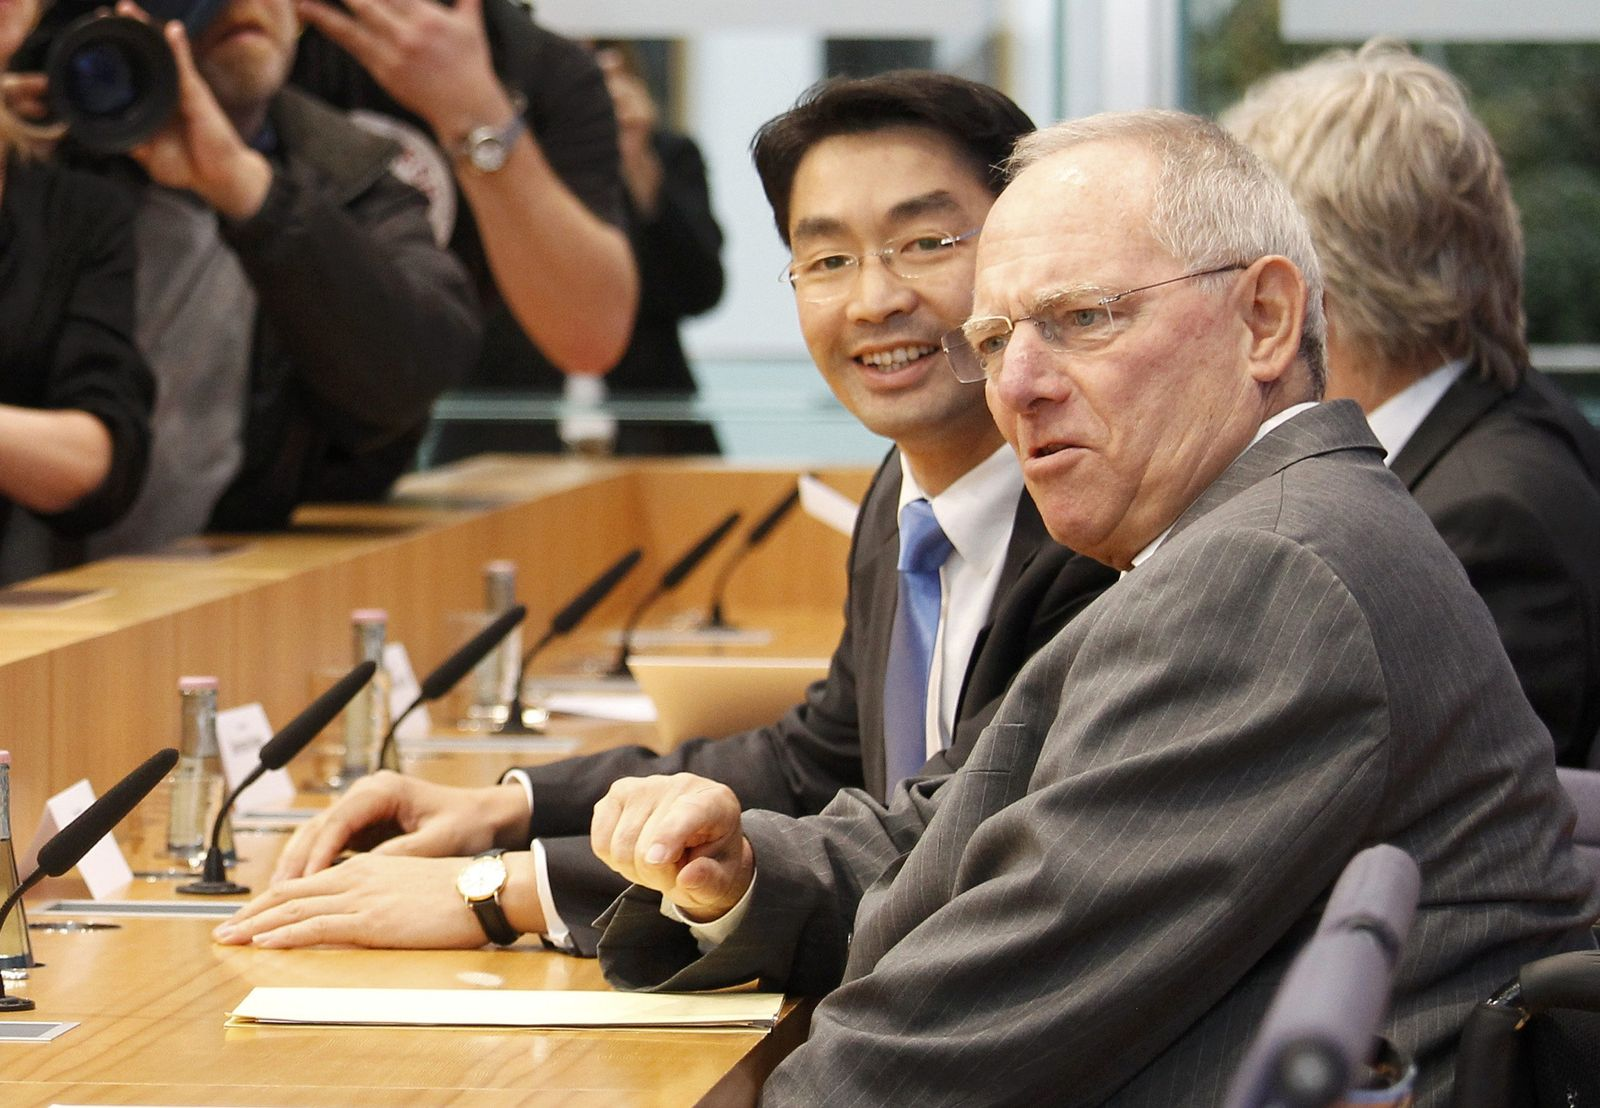 Schäuble/ Rösler/ BPK